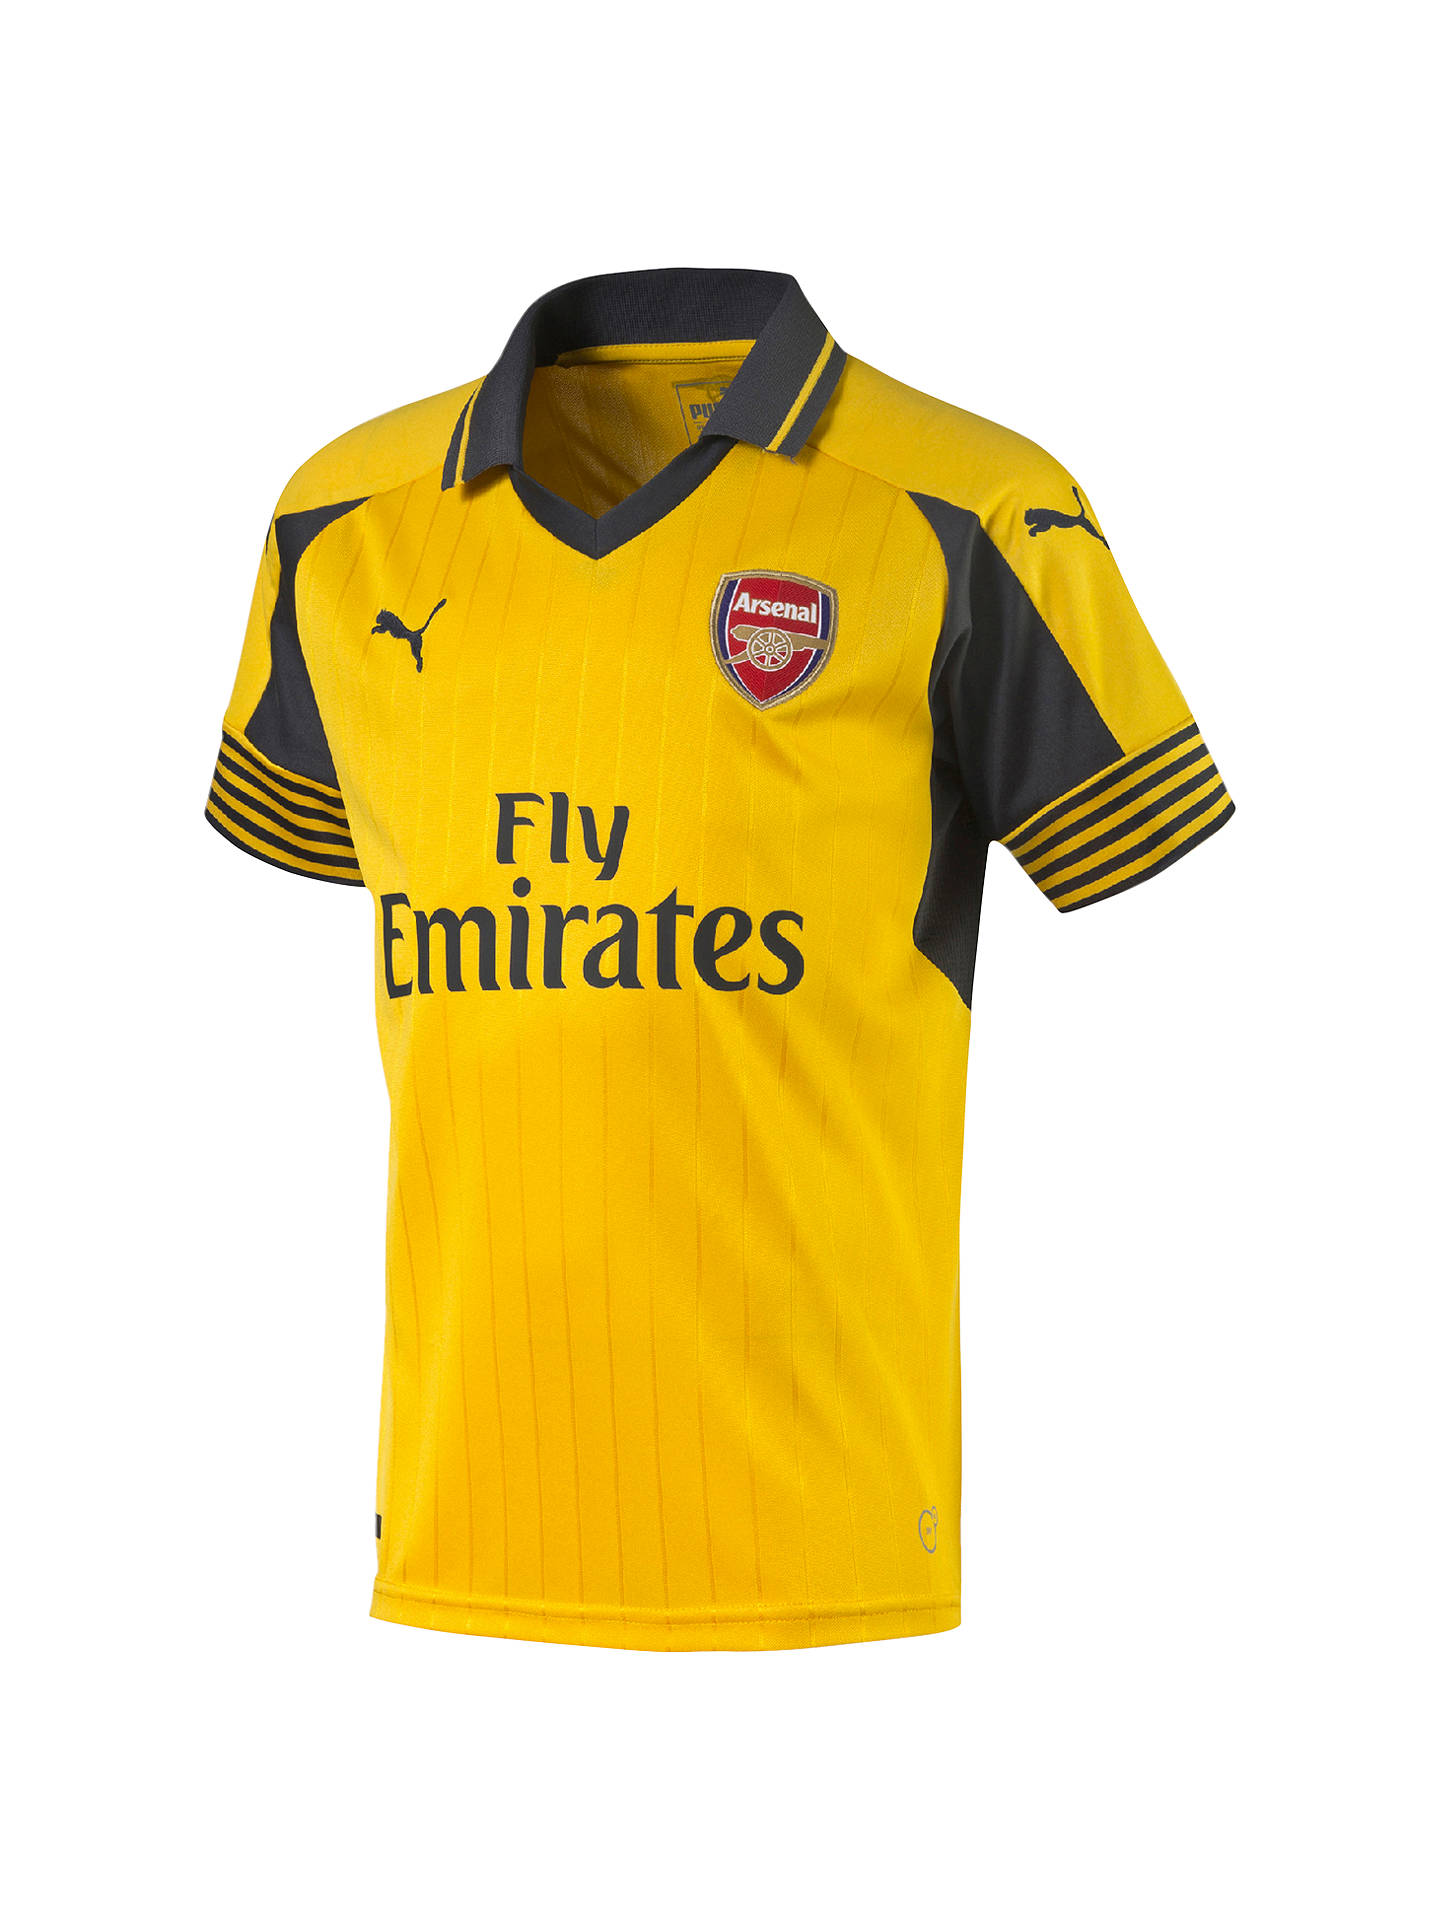 dd9dc94f428 Buy Puma Children s Arsenal F.C. 2016 17 Away Football Shirt